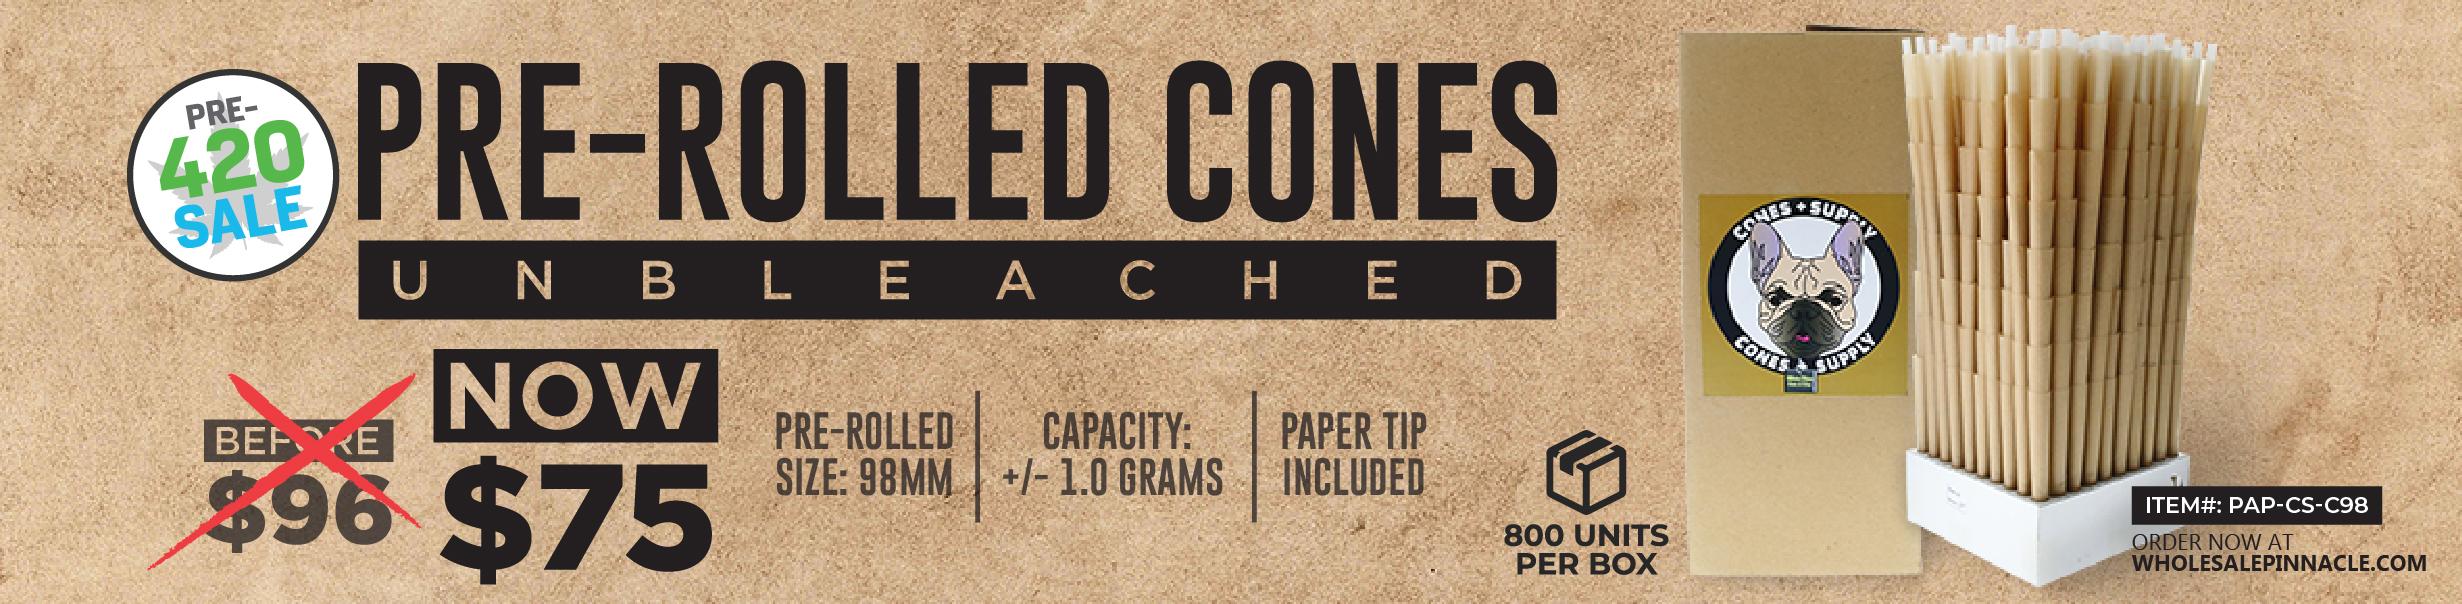 Bulk Pre Rolled Cones